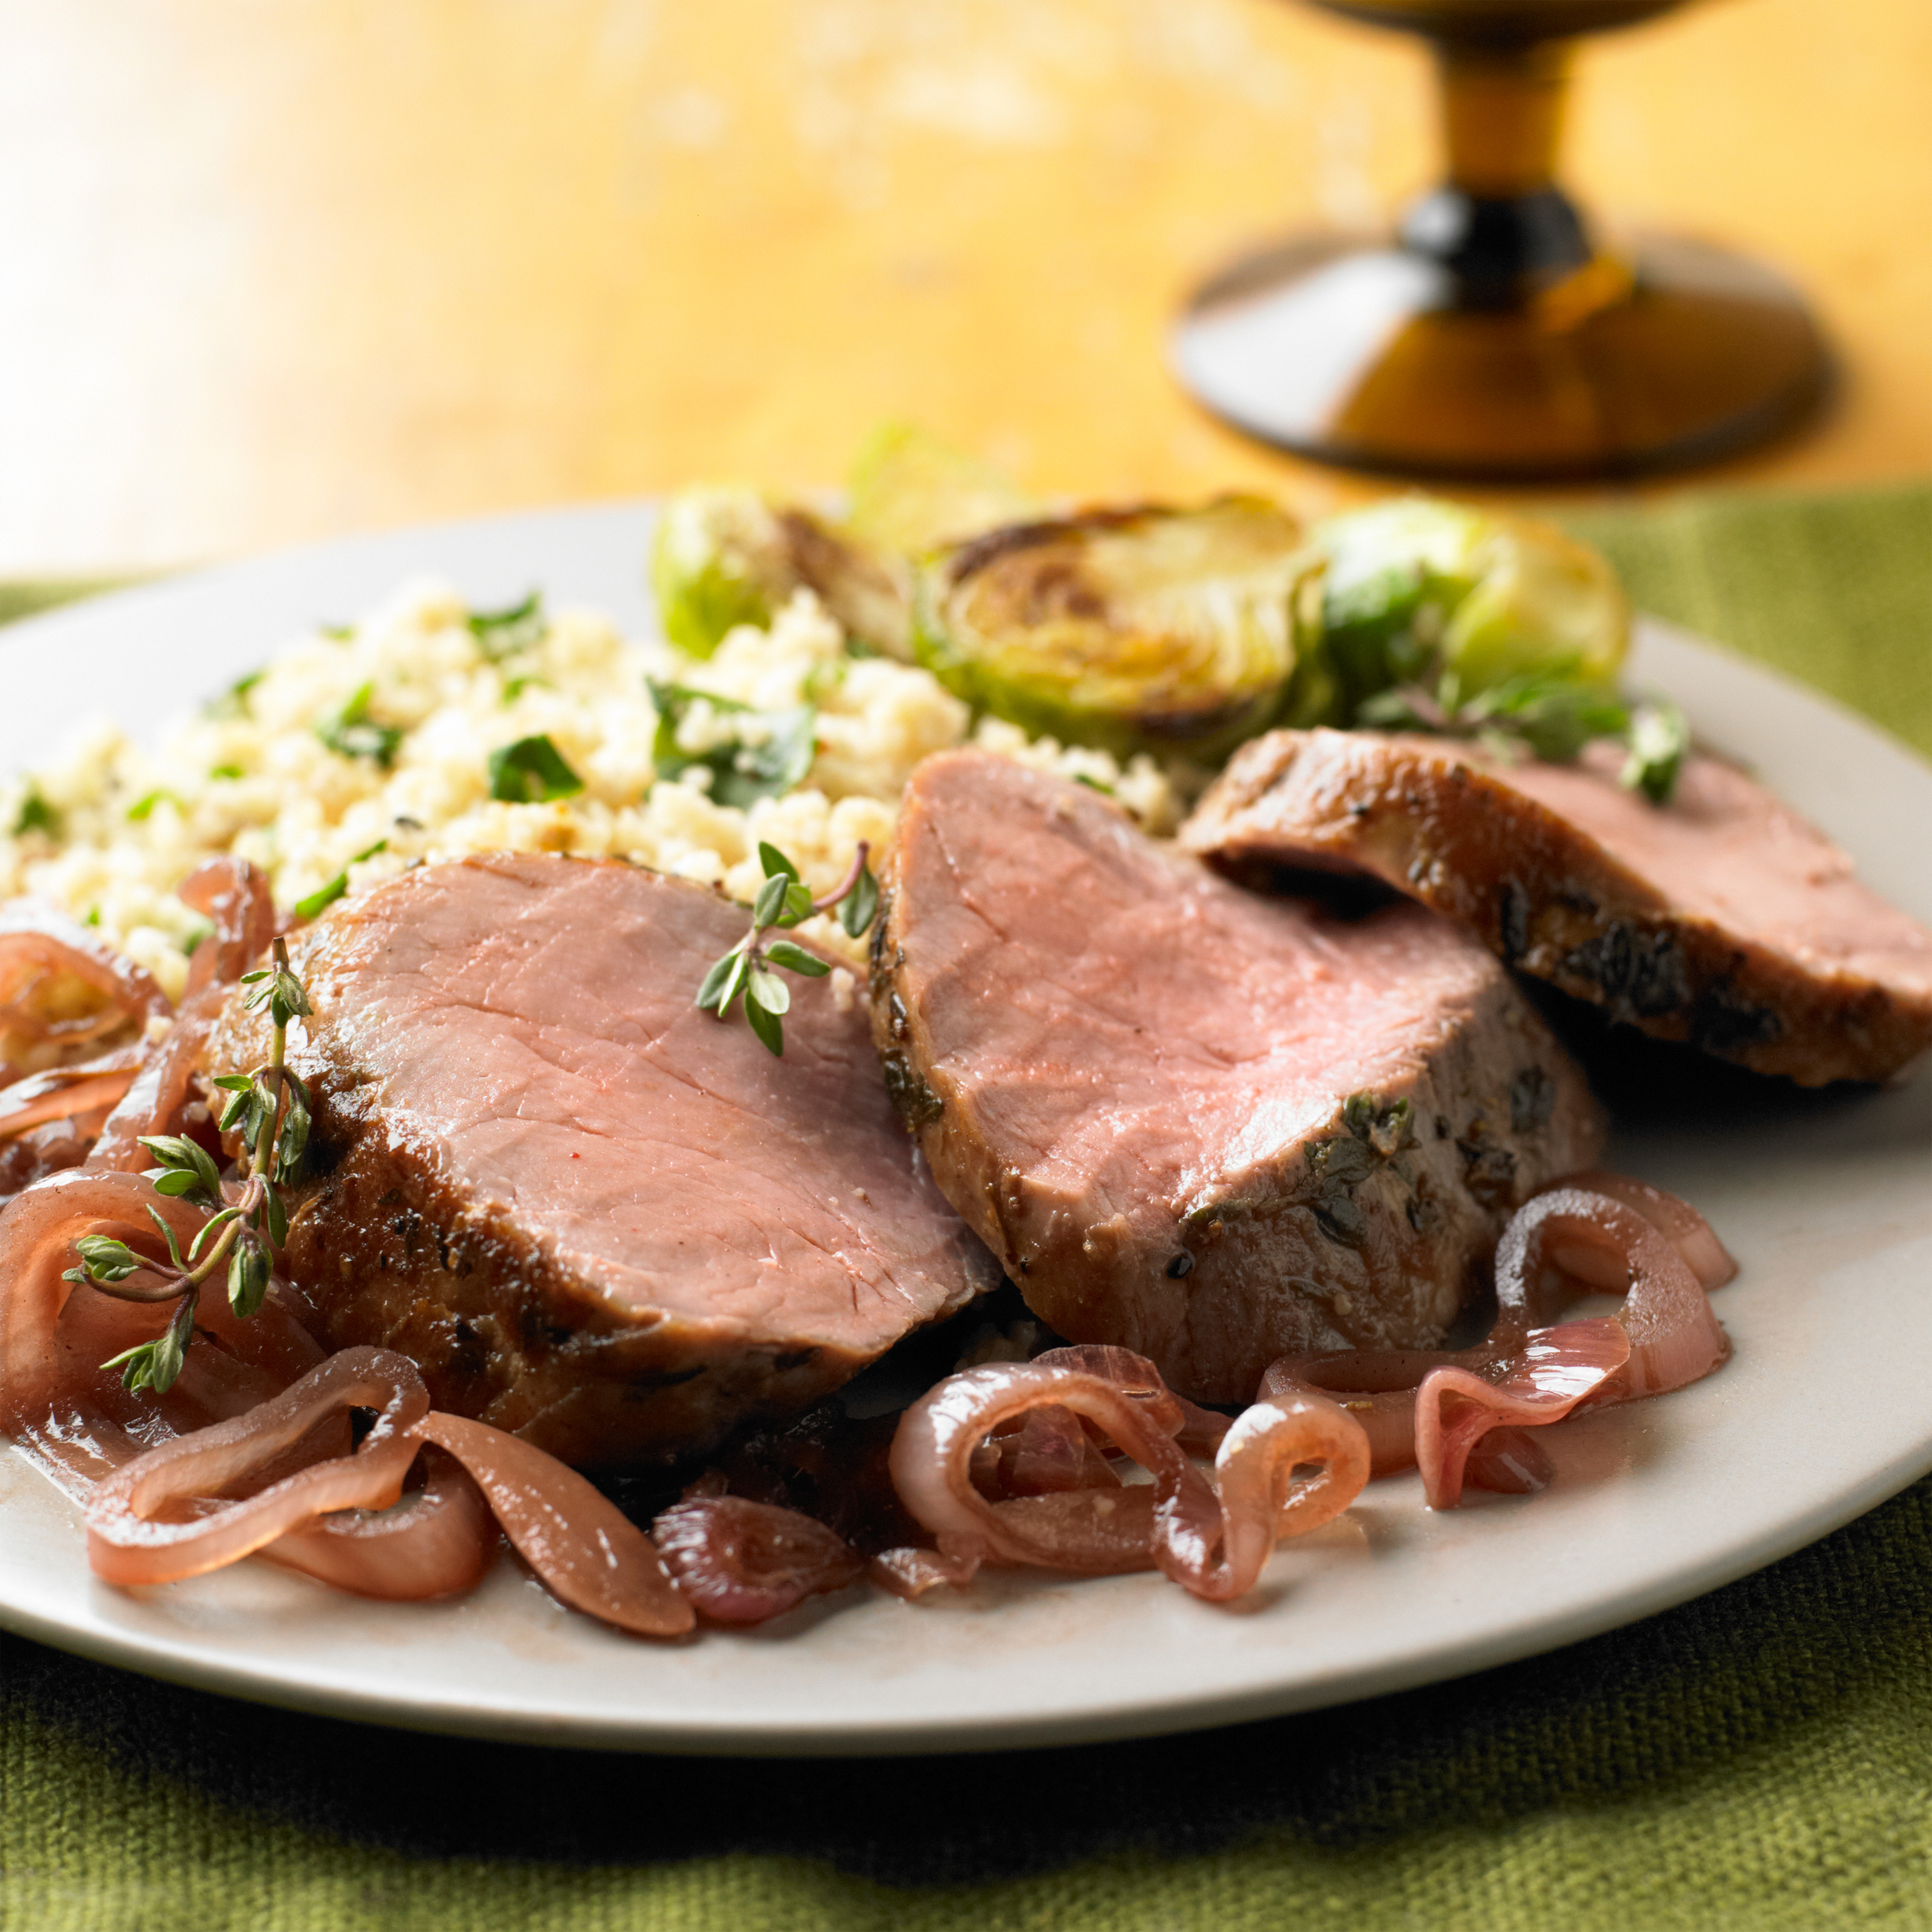 Thyme-Roasted Pork Tenderloin With Balsamic Shallot